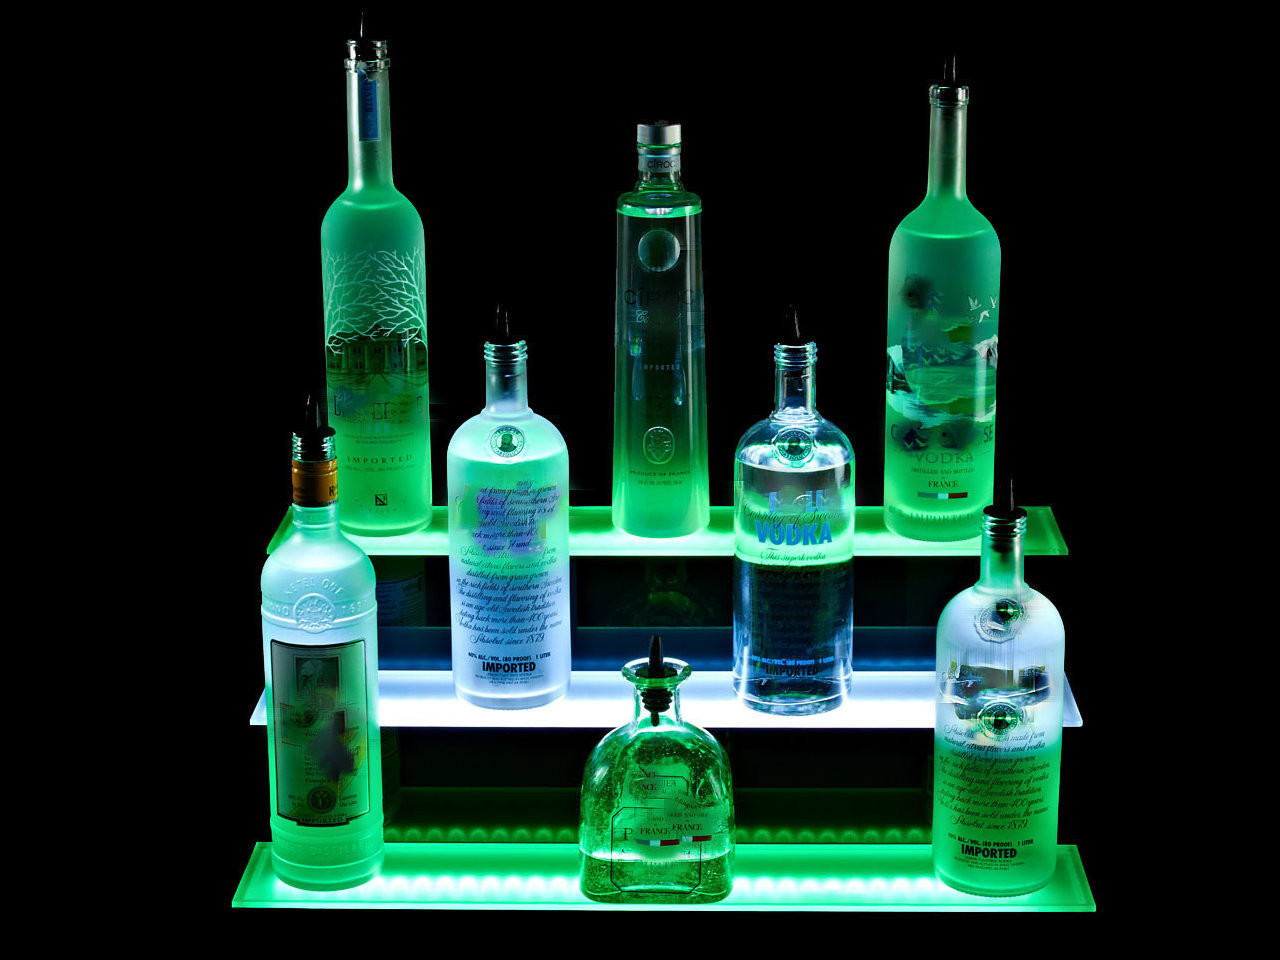 LED SHELVE,remote controlled, multi-color, illuminated, LED, Bar, Shelf, Liquor, Bottle, Light up, Glorifier, Showcase,Bar top